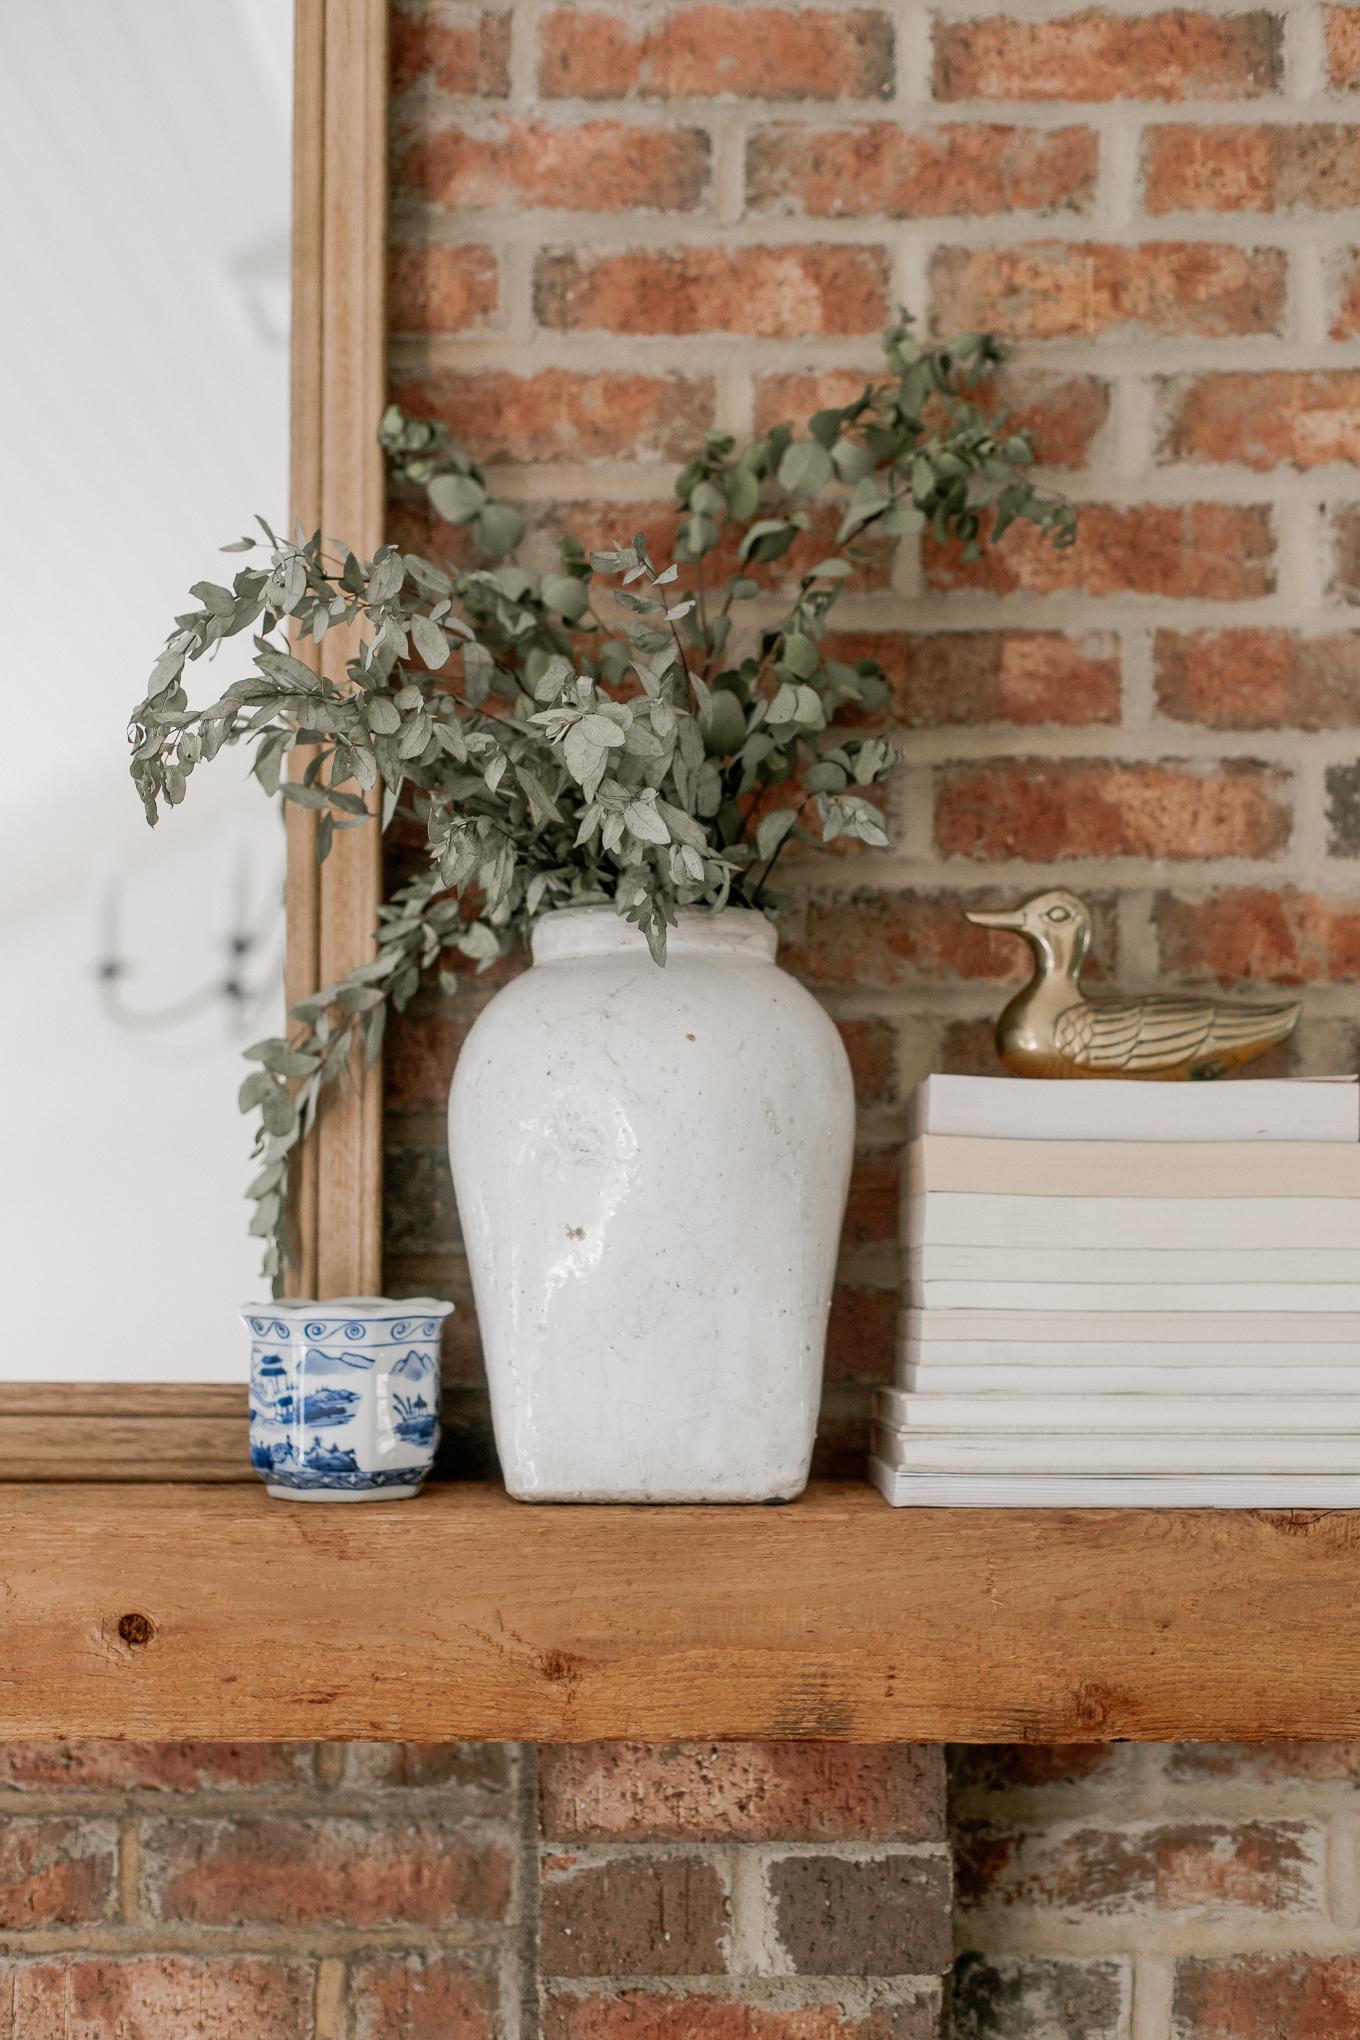 Vintage Inspired Vase, Brass Duck, Mantel Decor | Louella Reese